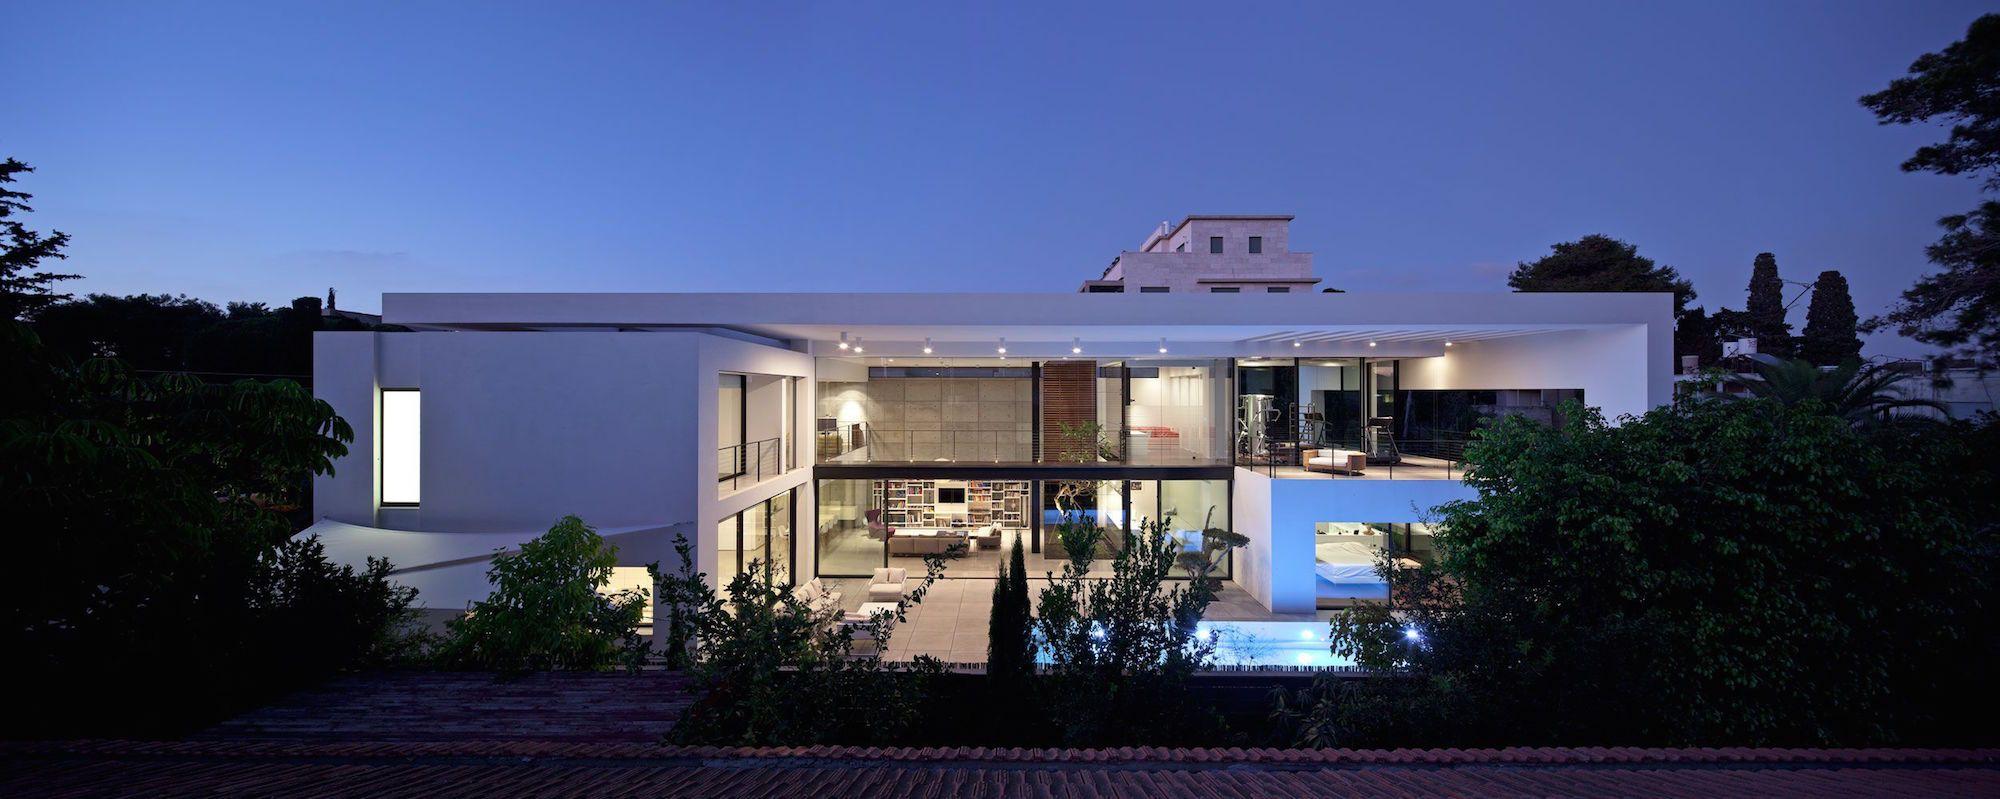 Contemporary-Bauhaus-on-the-Carmel-00-1.